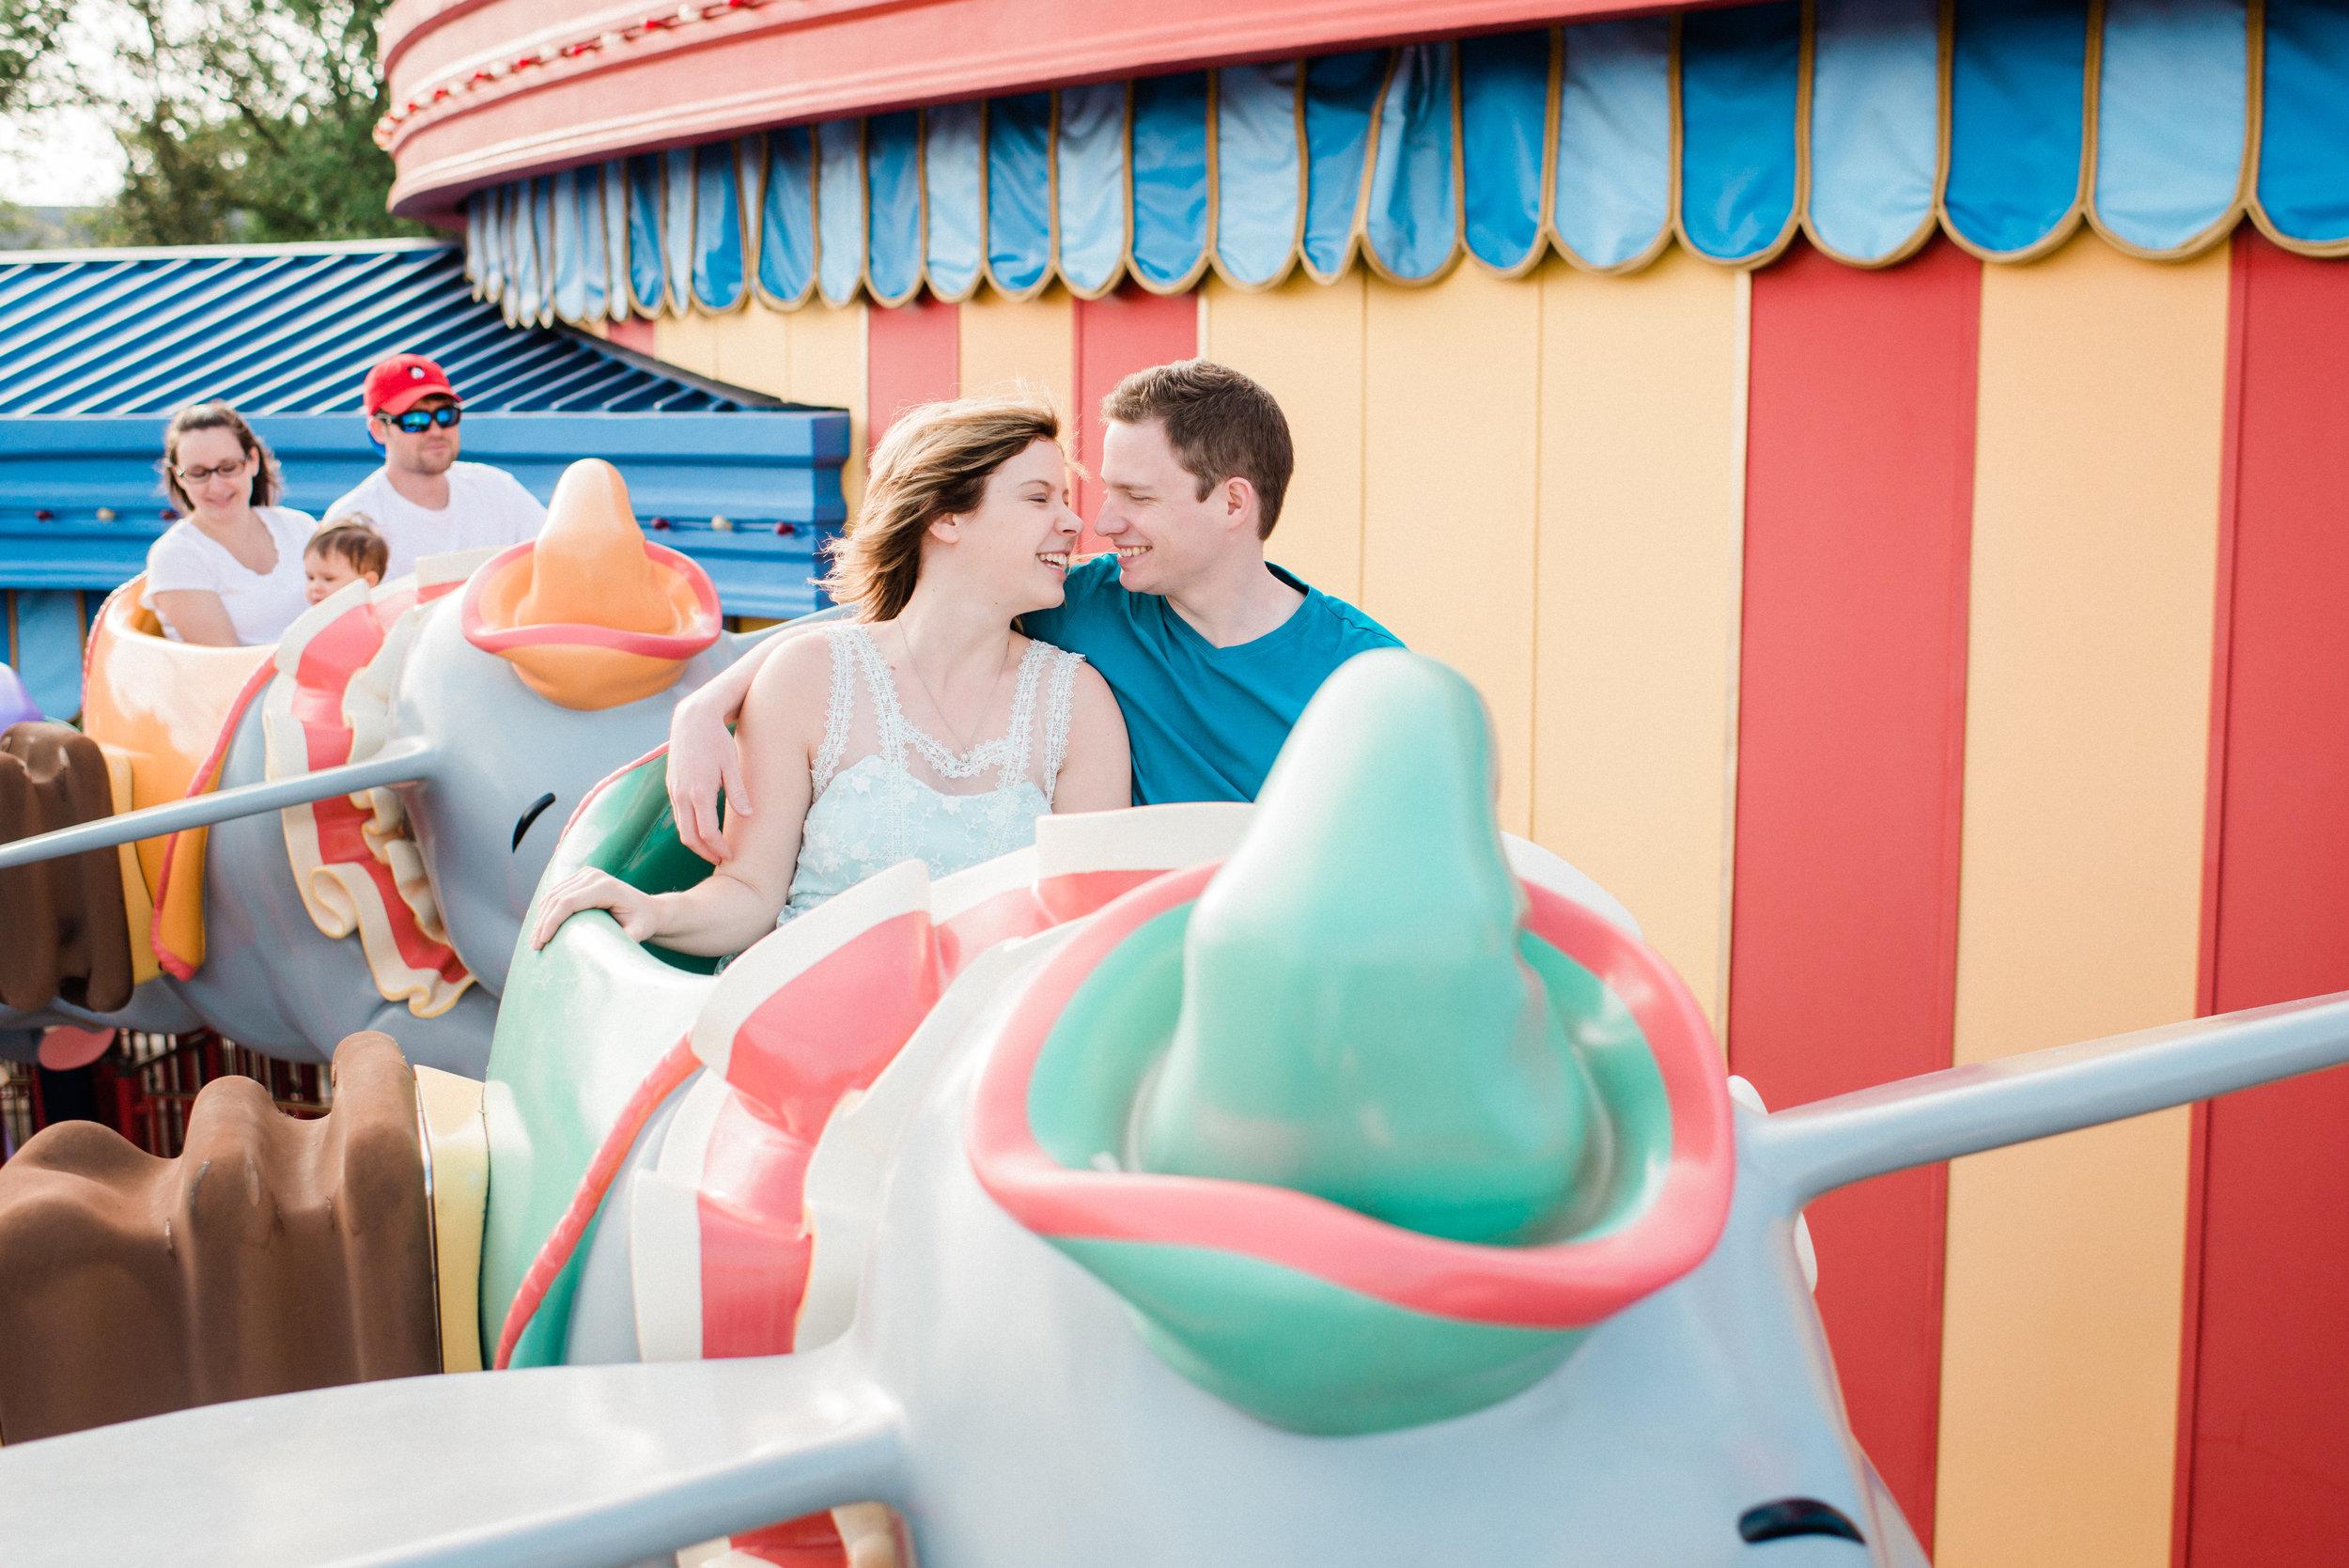 KateTaramykinStudios-Disney-World-Magic-Kingdom-Portraits-KristenDylan-21.jpg